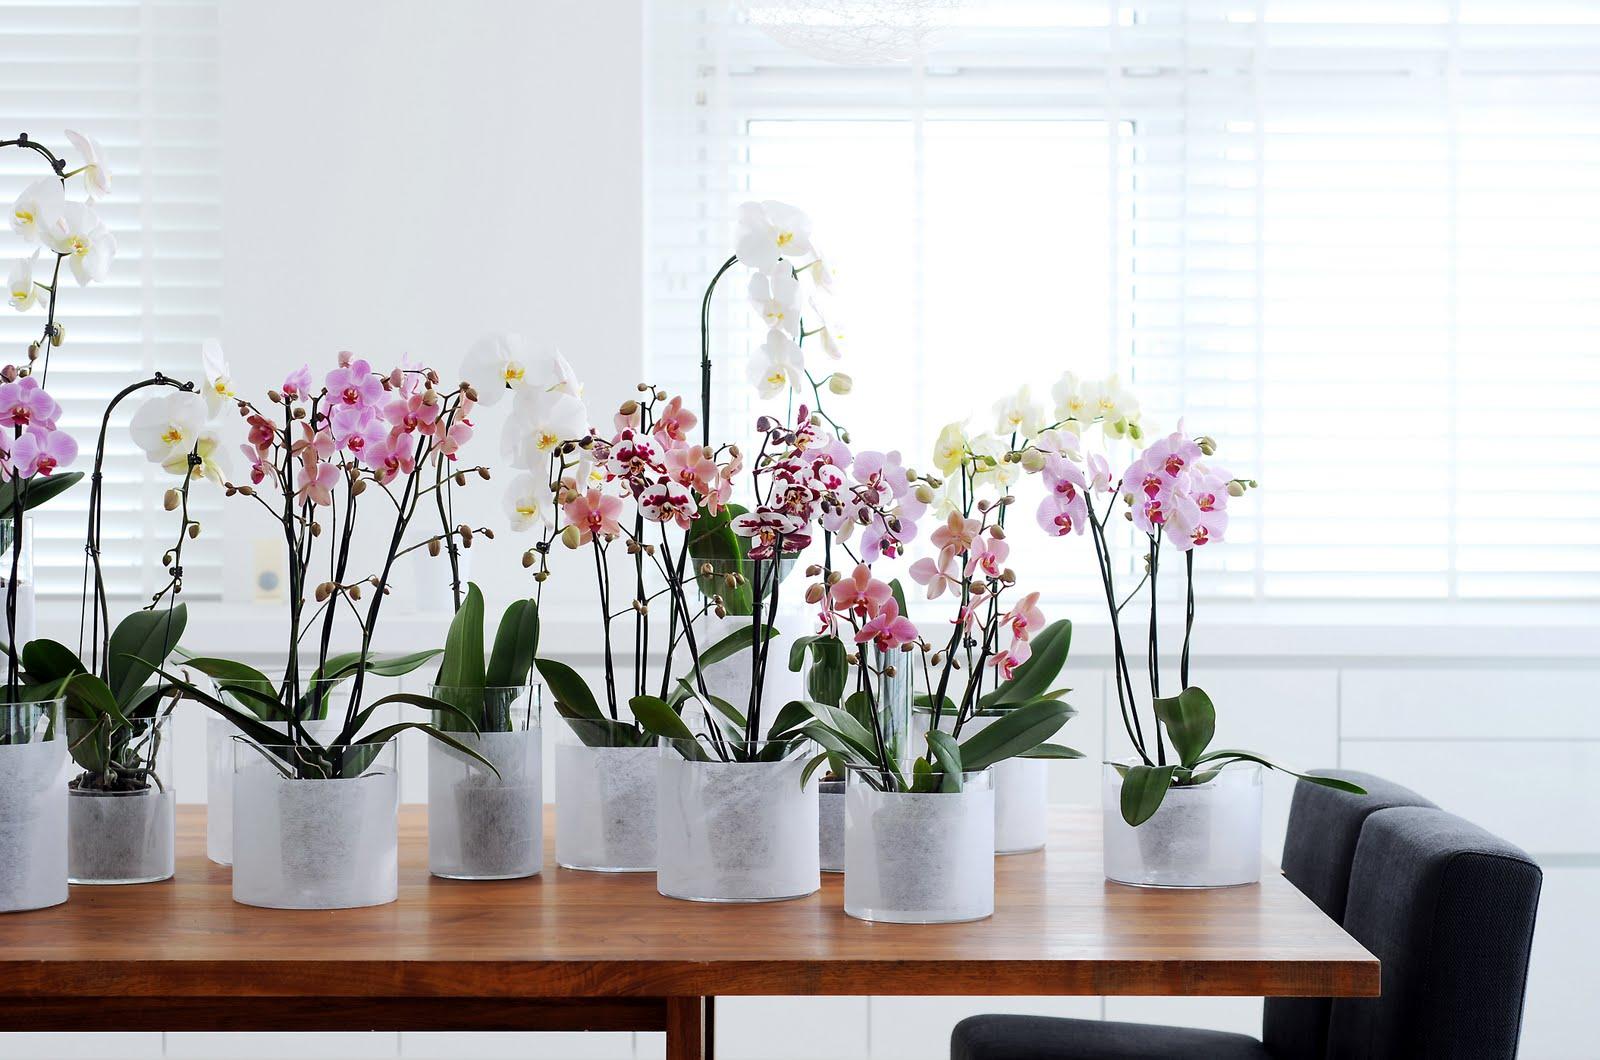 Фаленопсис домашний: тропический цветок в условиях города (24 фото)